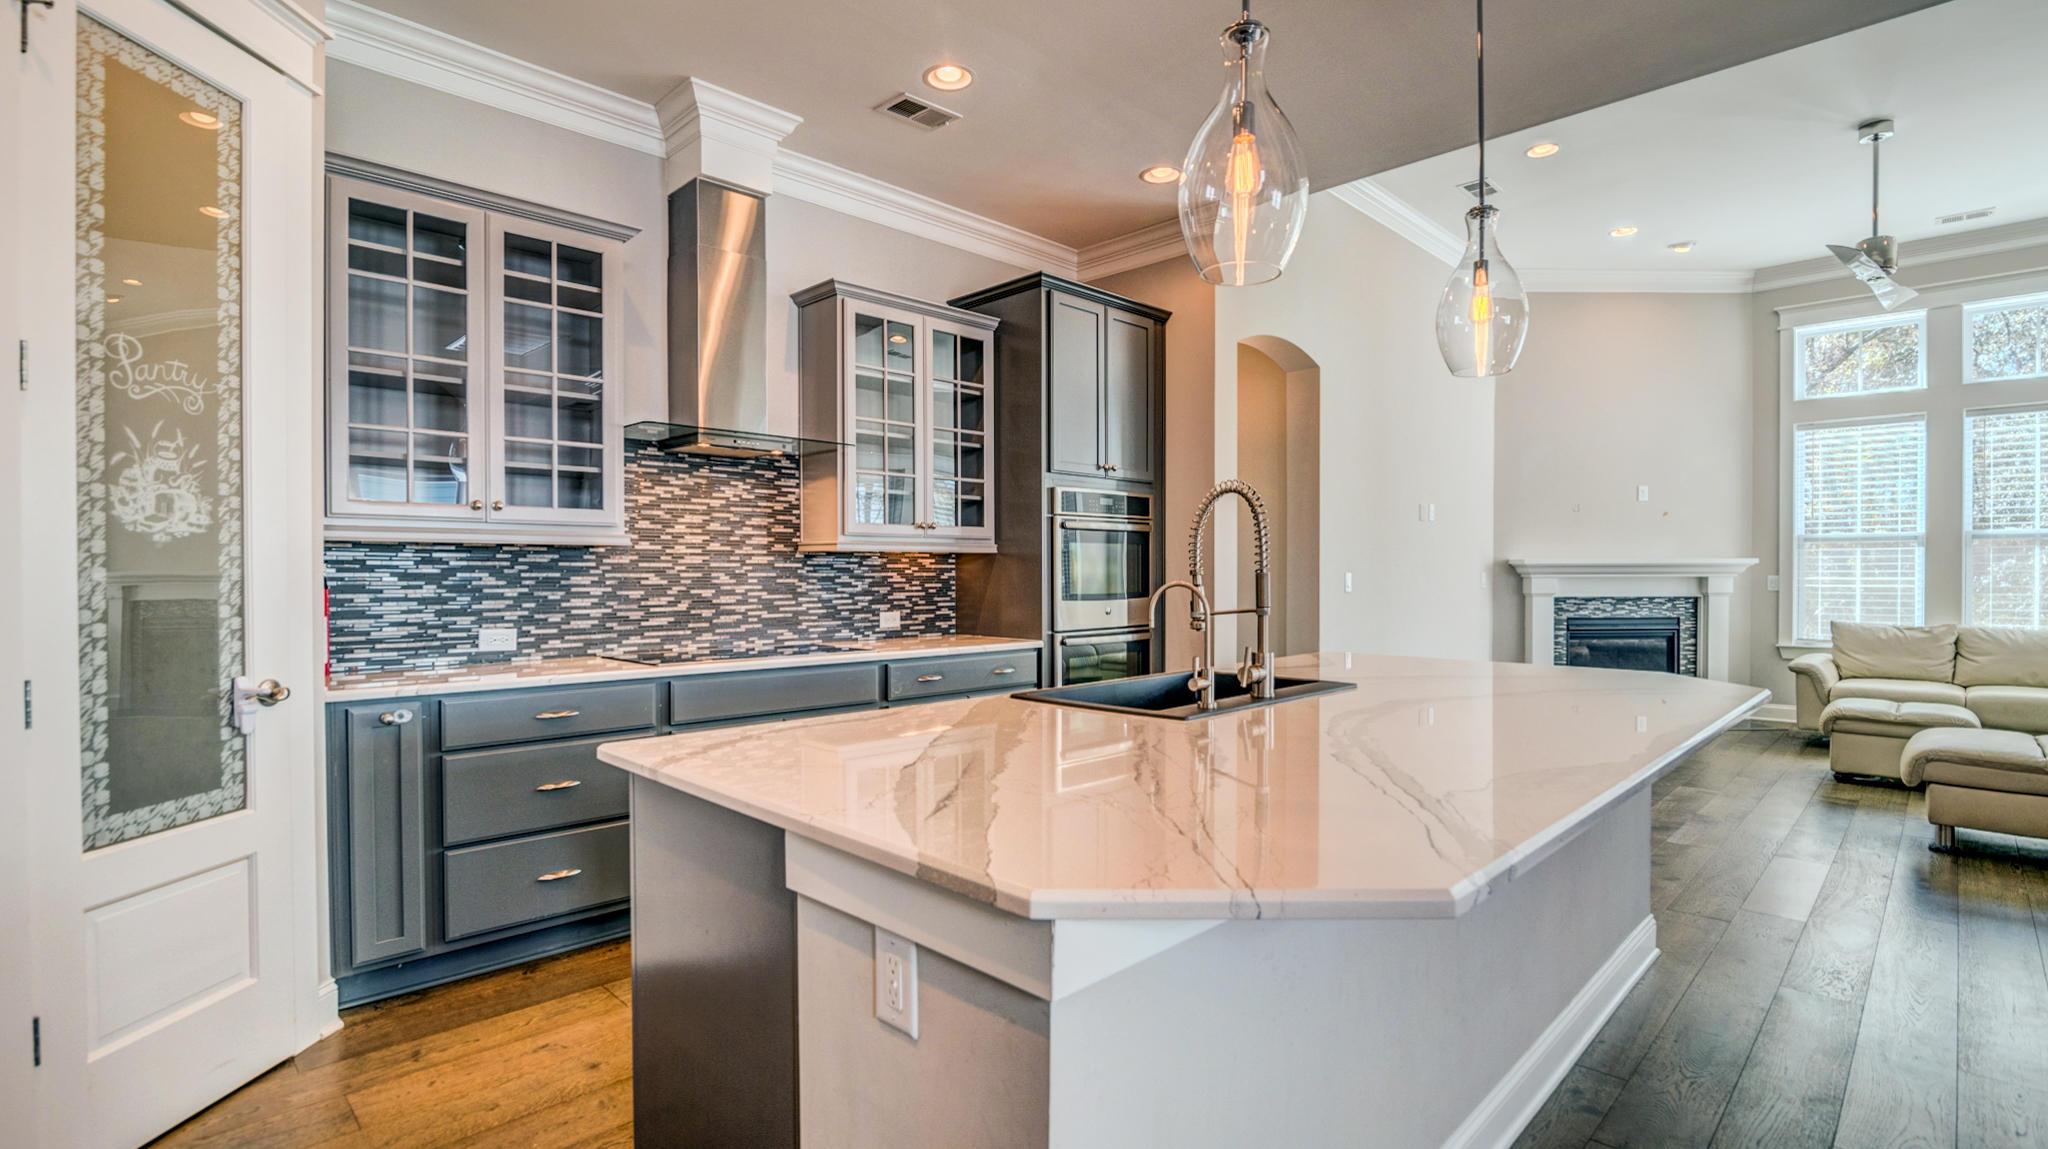 Carolina Park Homes For Sale - 3687 Spindrift, Mount Pleasant, SC - 14